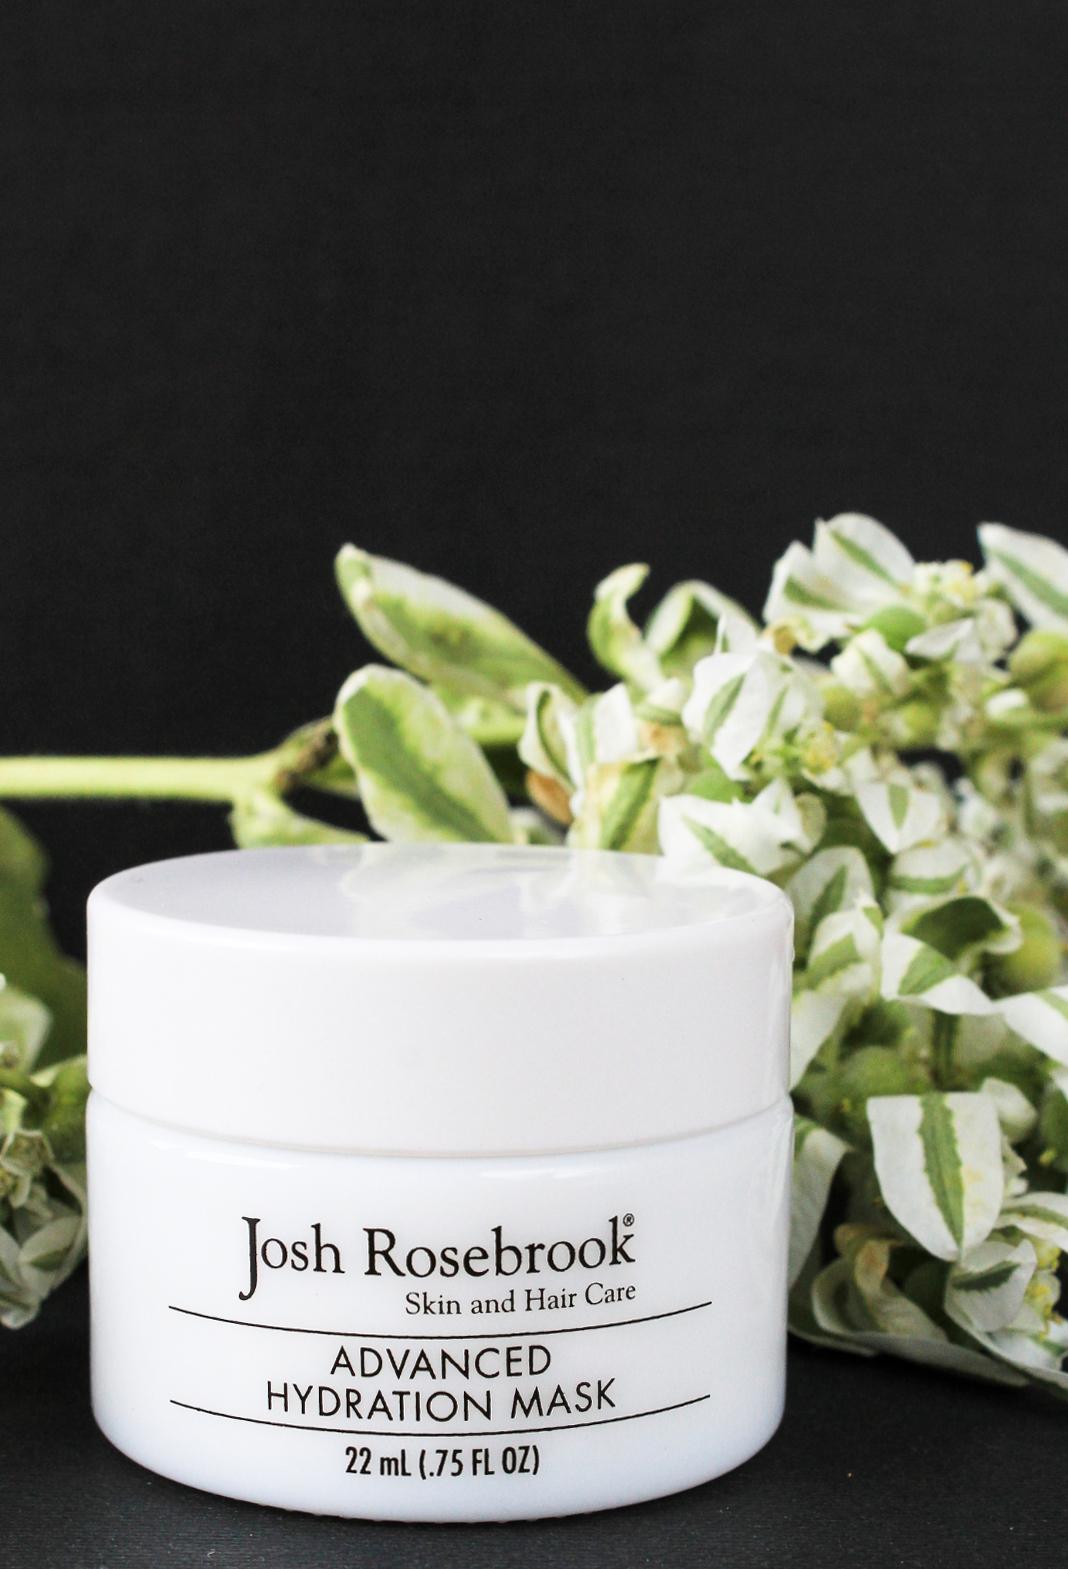 Beauty Heroes September 2018 Beauty Discovery Box Josh Rosebrook Advanced Hydration Mask